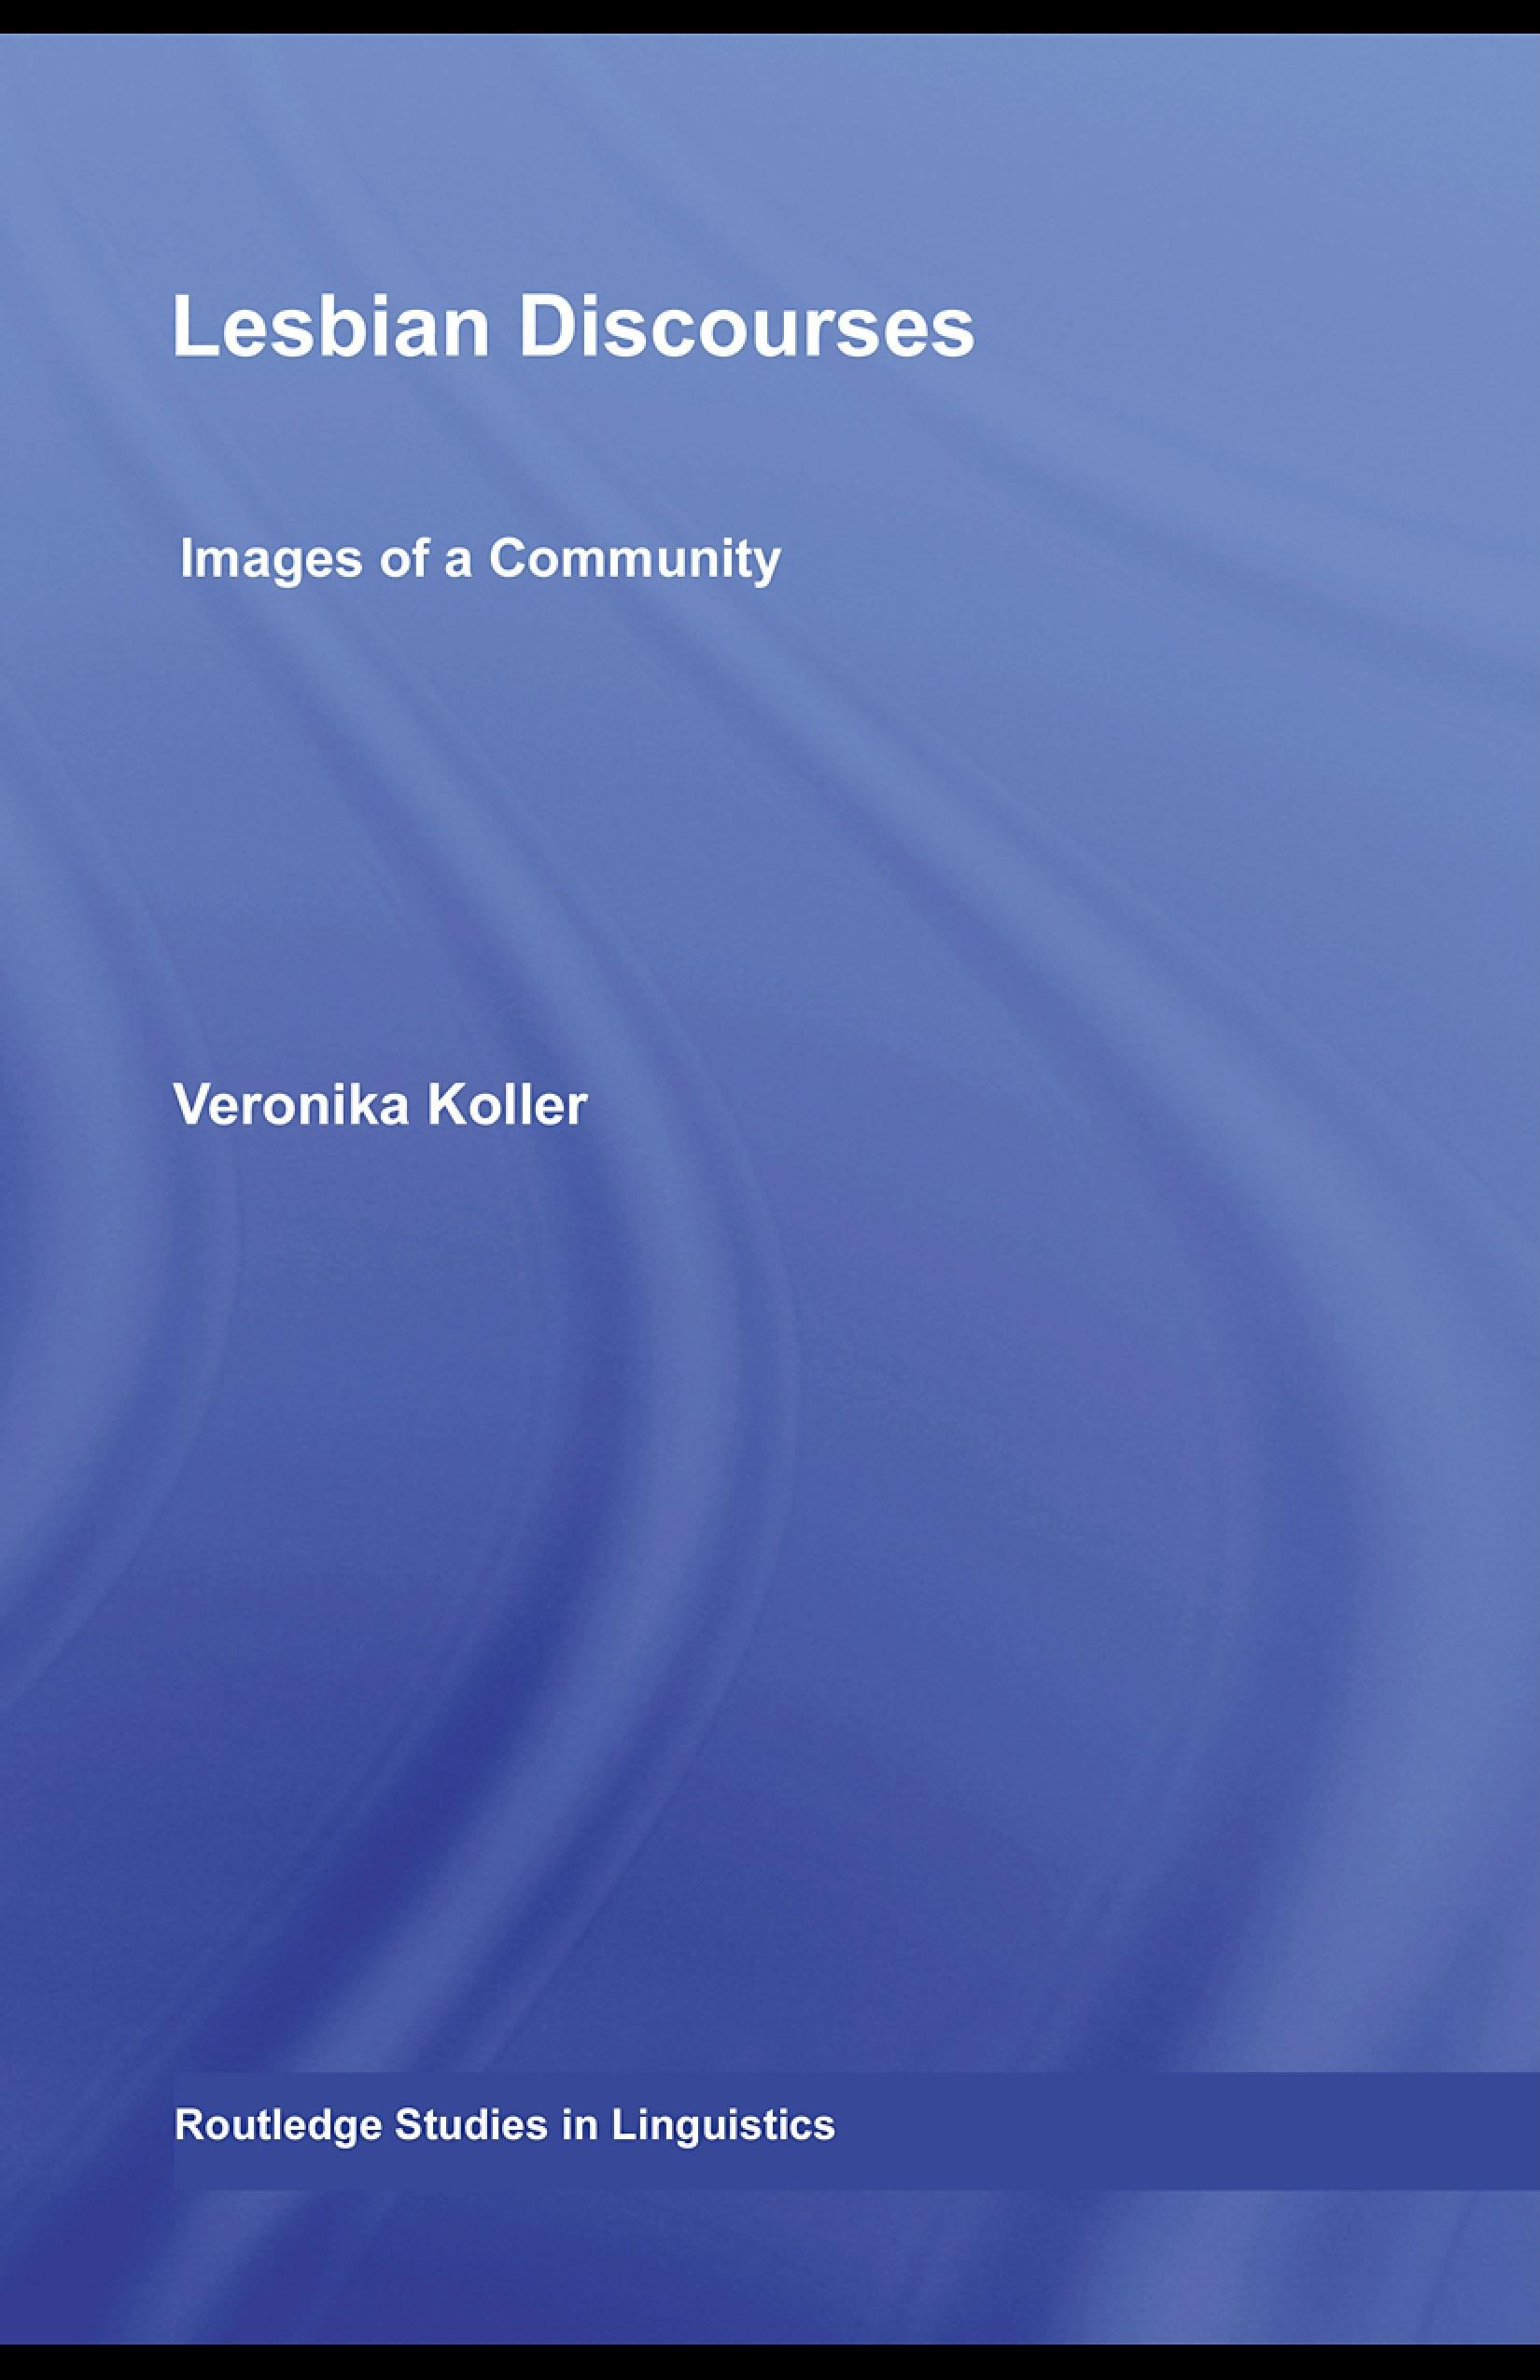 Lesbian Discourses: Images of a Community EB9780203928691